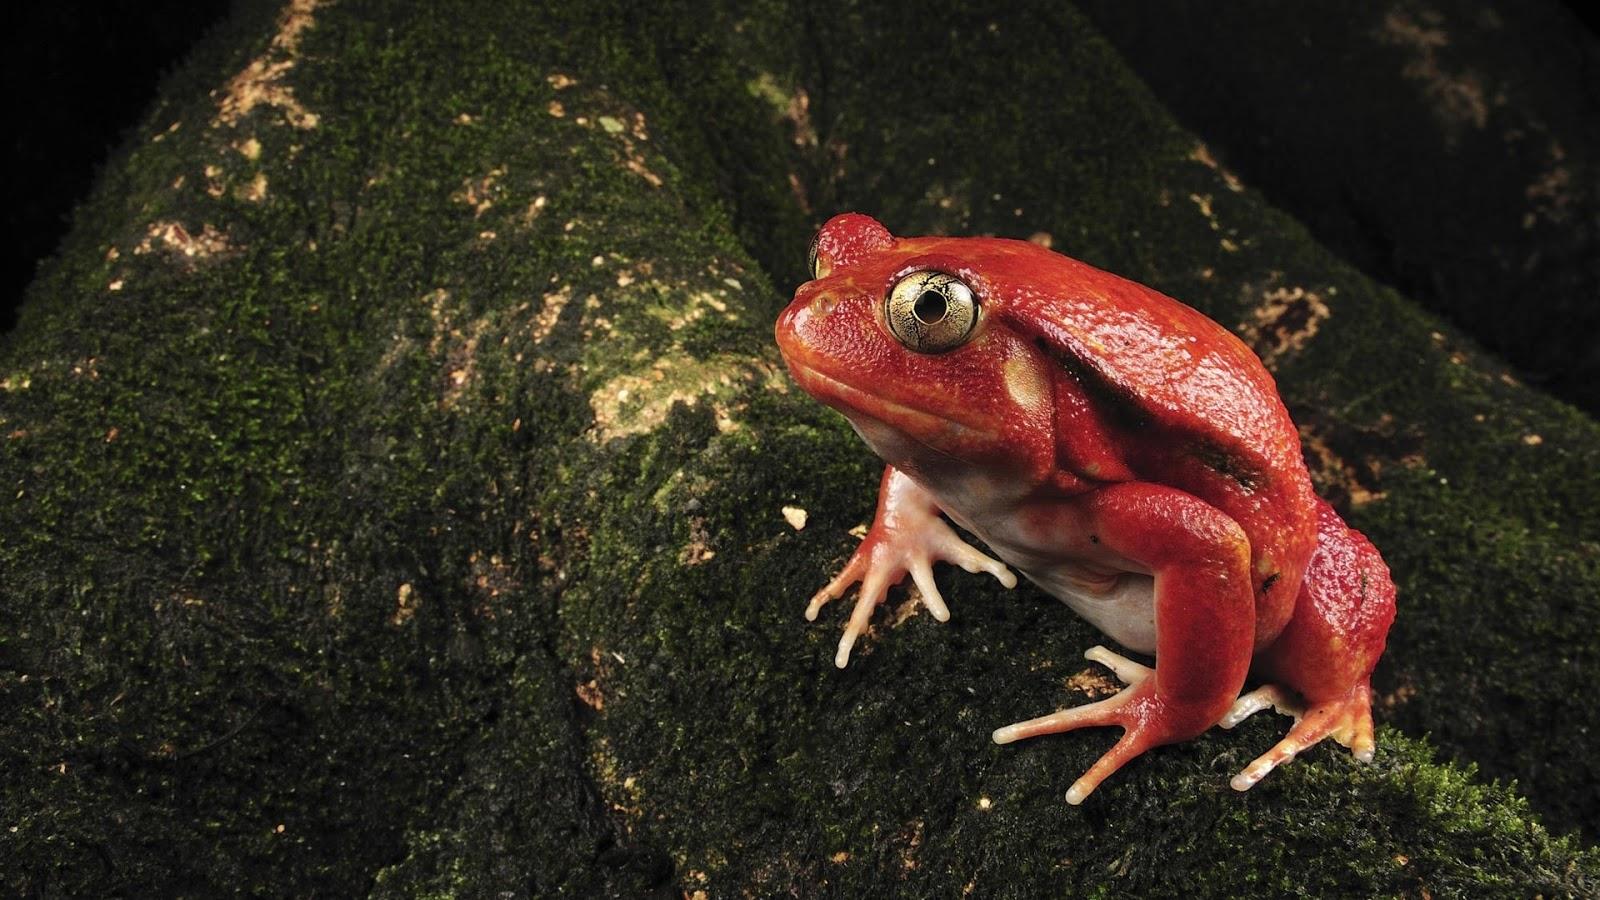 hd wallpapers desktop frogs hd wallpapers